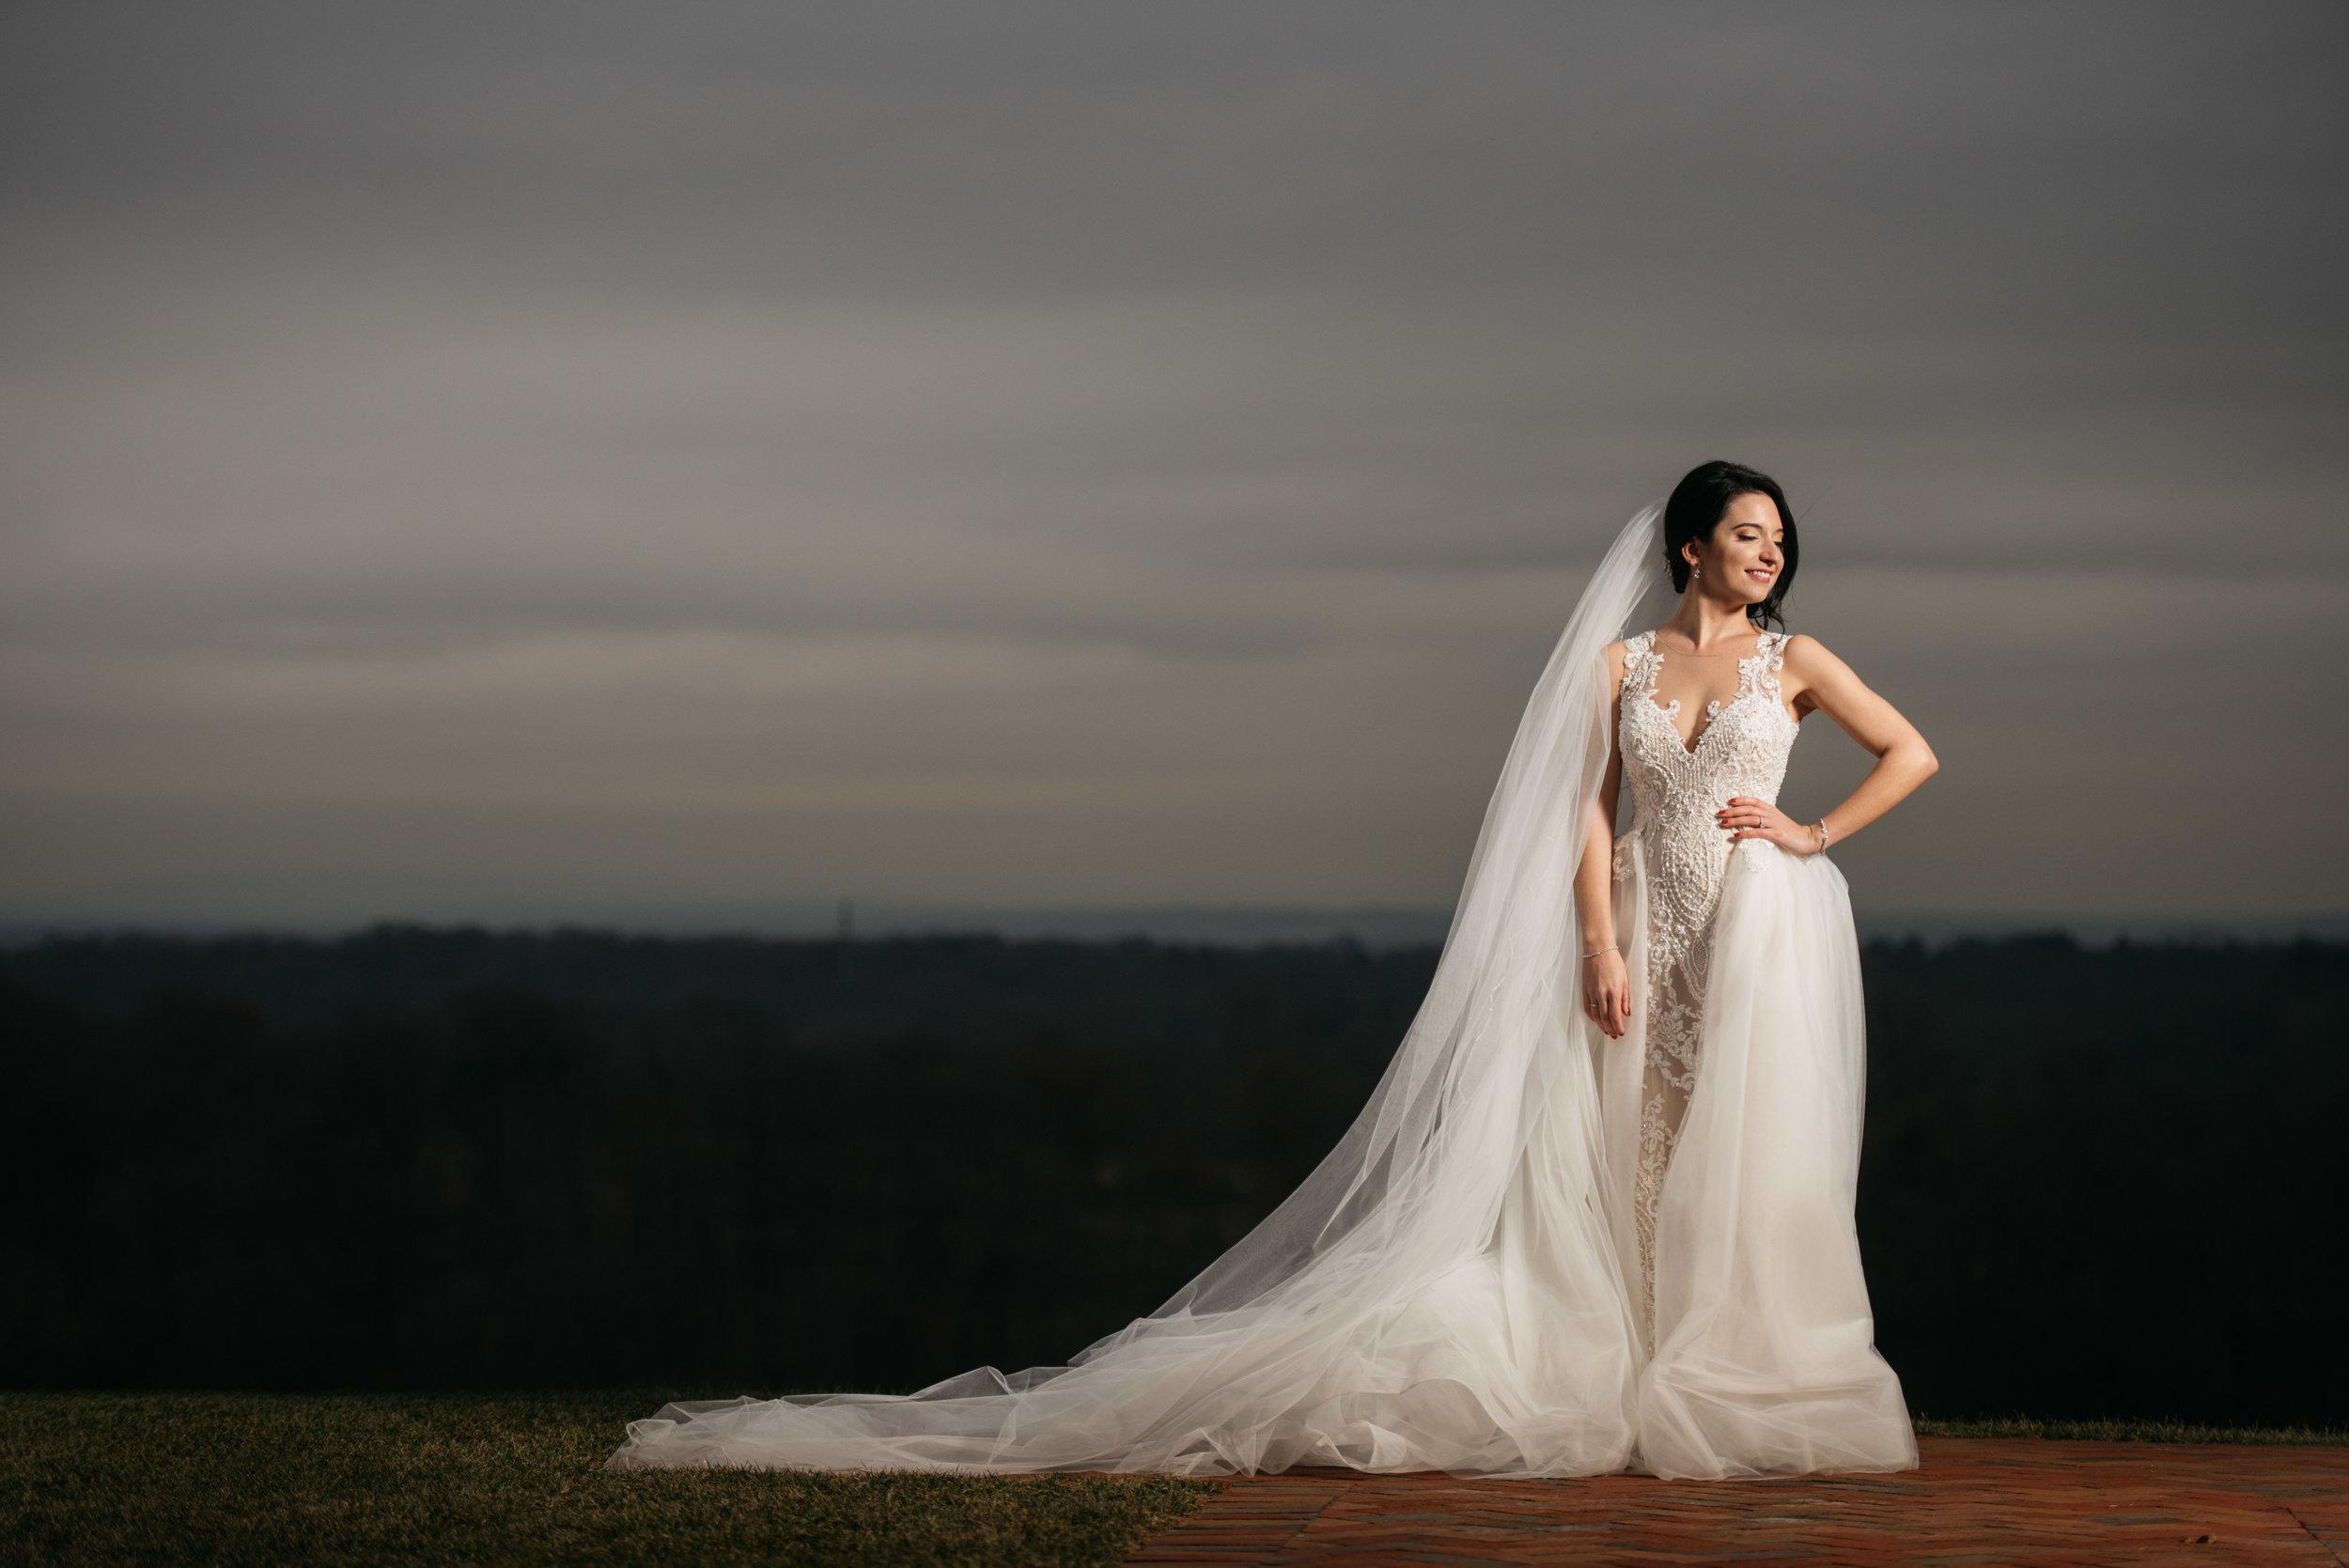 WeddingPhotos | NJPhotographer | Highlights-11-24.jpg